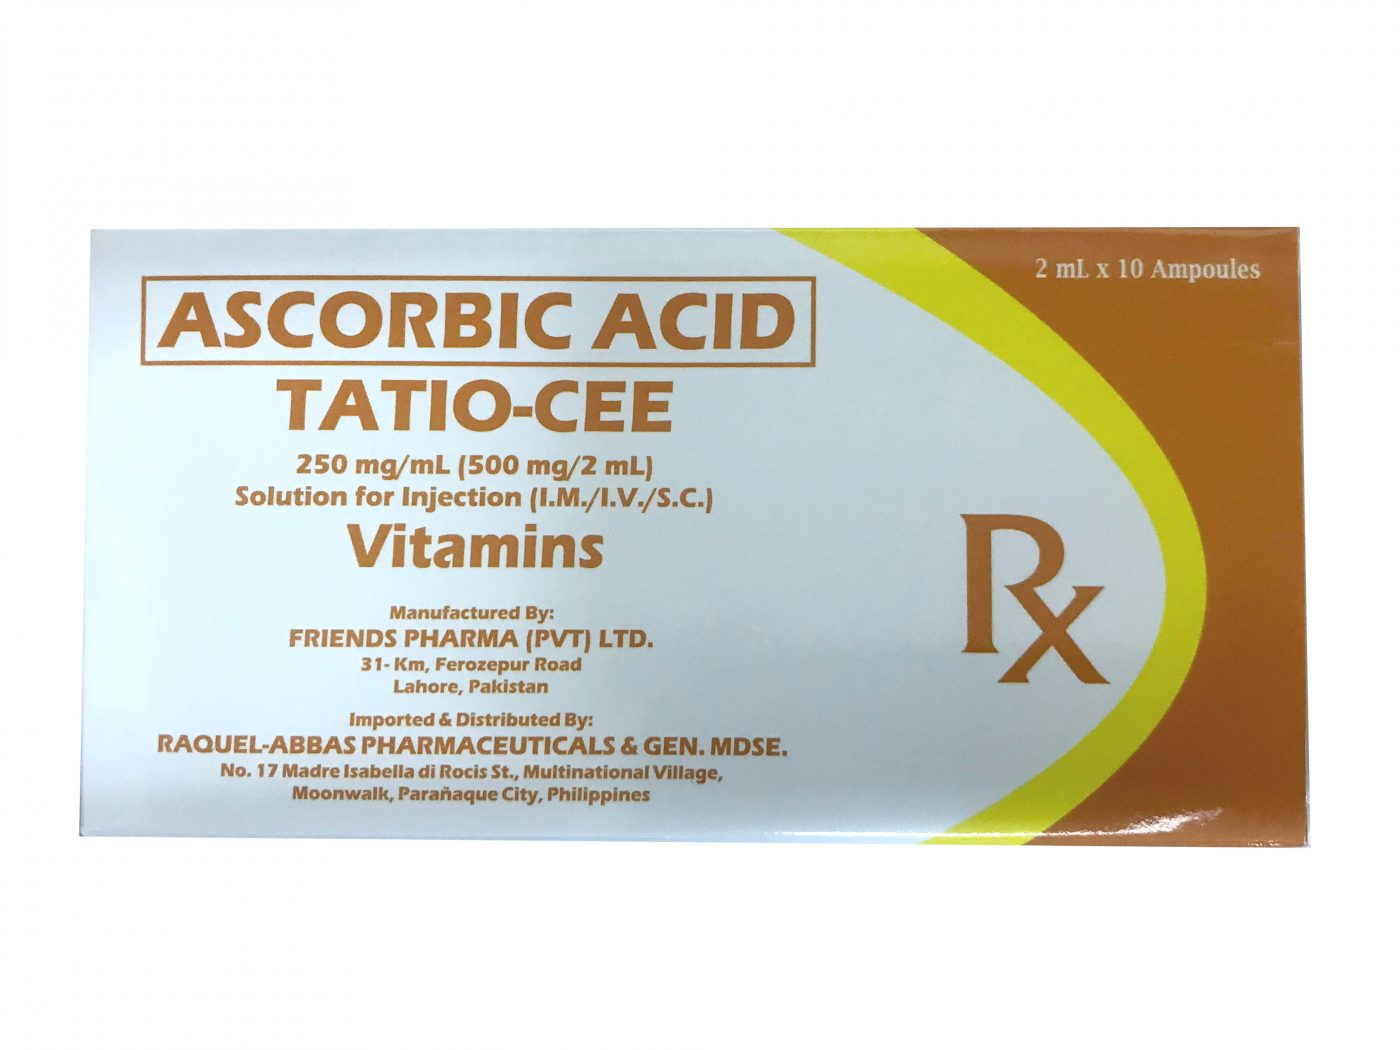 Tatio-Cee Ascorbic Acid